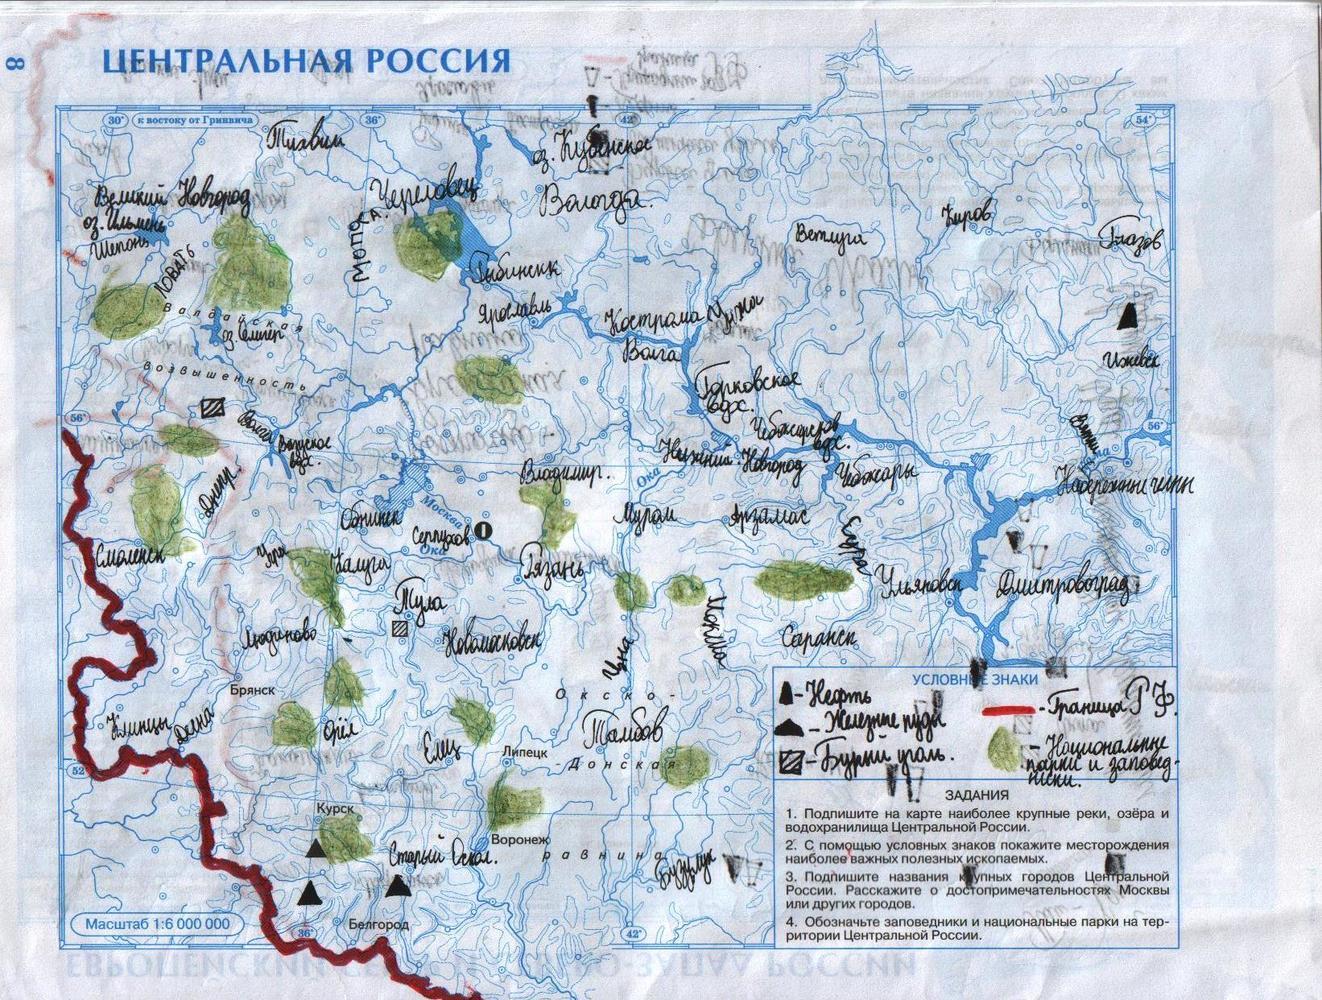 Гдз по контурным картам 8 класс центральная россия